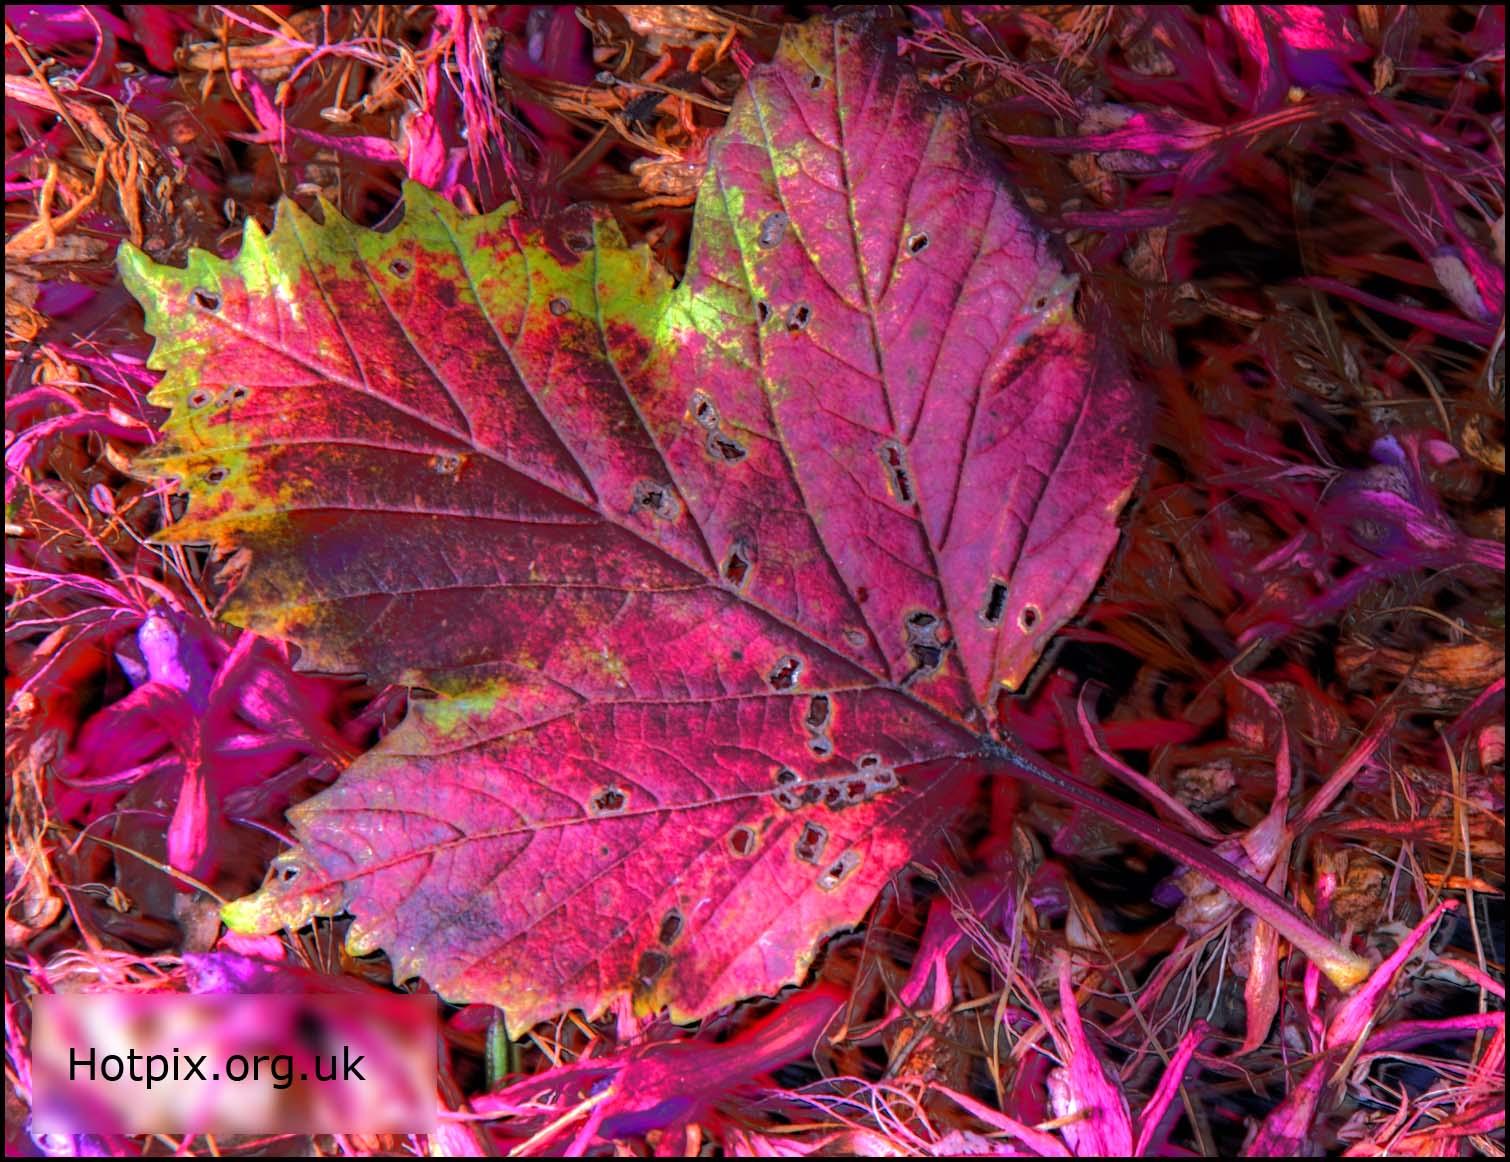 red,leaf,autumn,fuscia,bush,plant,flower,purple,petal,petals,decay,rotting,england,northwich,cheshire,weaverham,hotpixuk,hotpix,tonysmith,tony,smith,UK,TDKTony,photo,photos,photography,photographer,hotpix.org.uk,www.hotpix.org.uk,www.thewdcc.org.uk,thewdcc.org.uk,wdcc.org.uk,Warrington,society,District,Camera,club,photographic,SLR,DSLR,group,GYCA,Bellhouse,bellhouse Club,nature,natural,history,world,life,HDR,high dynamic range,bloom,flowers,flores,blome,stillife,stilllife,still